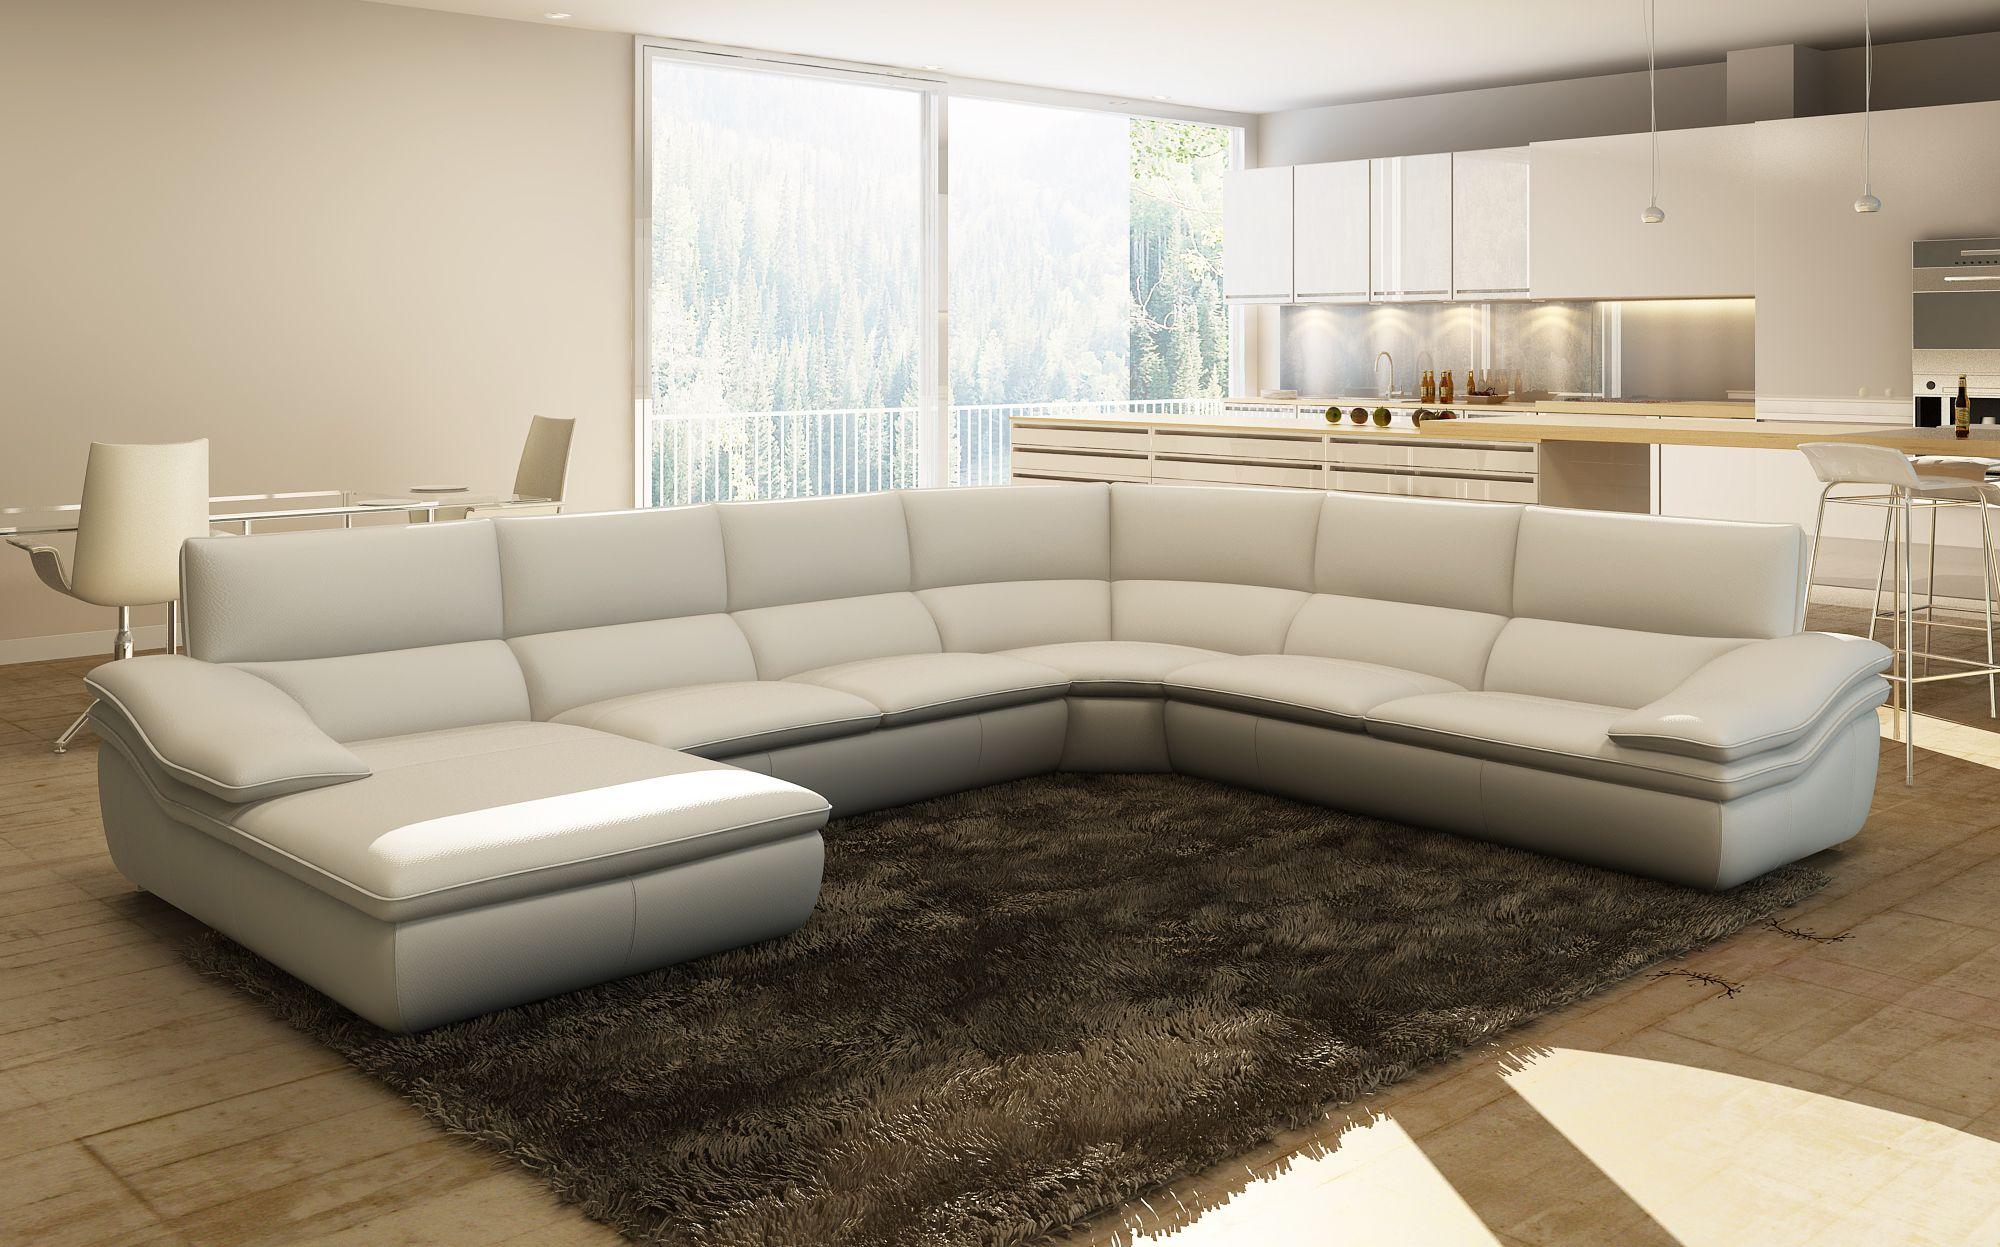 living room sweet special design sofa   Biggy Sectional   salas   Sofa, Living room sofa design ...